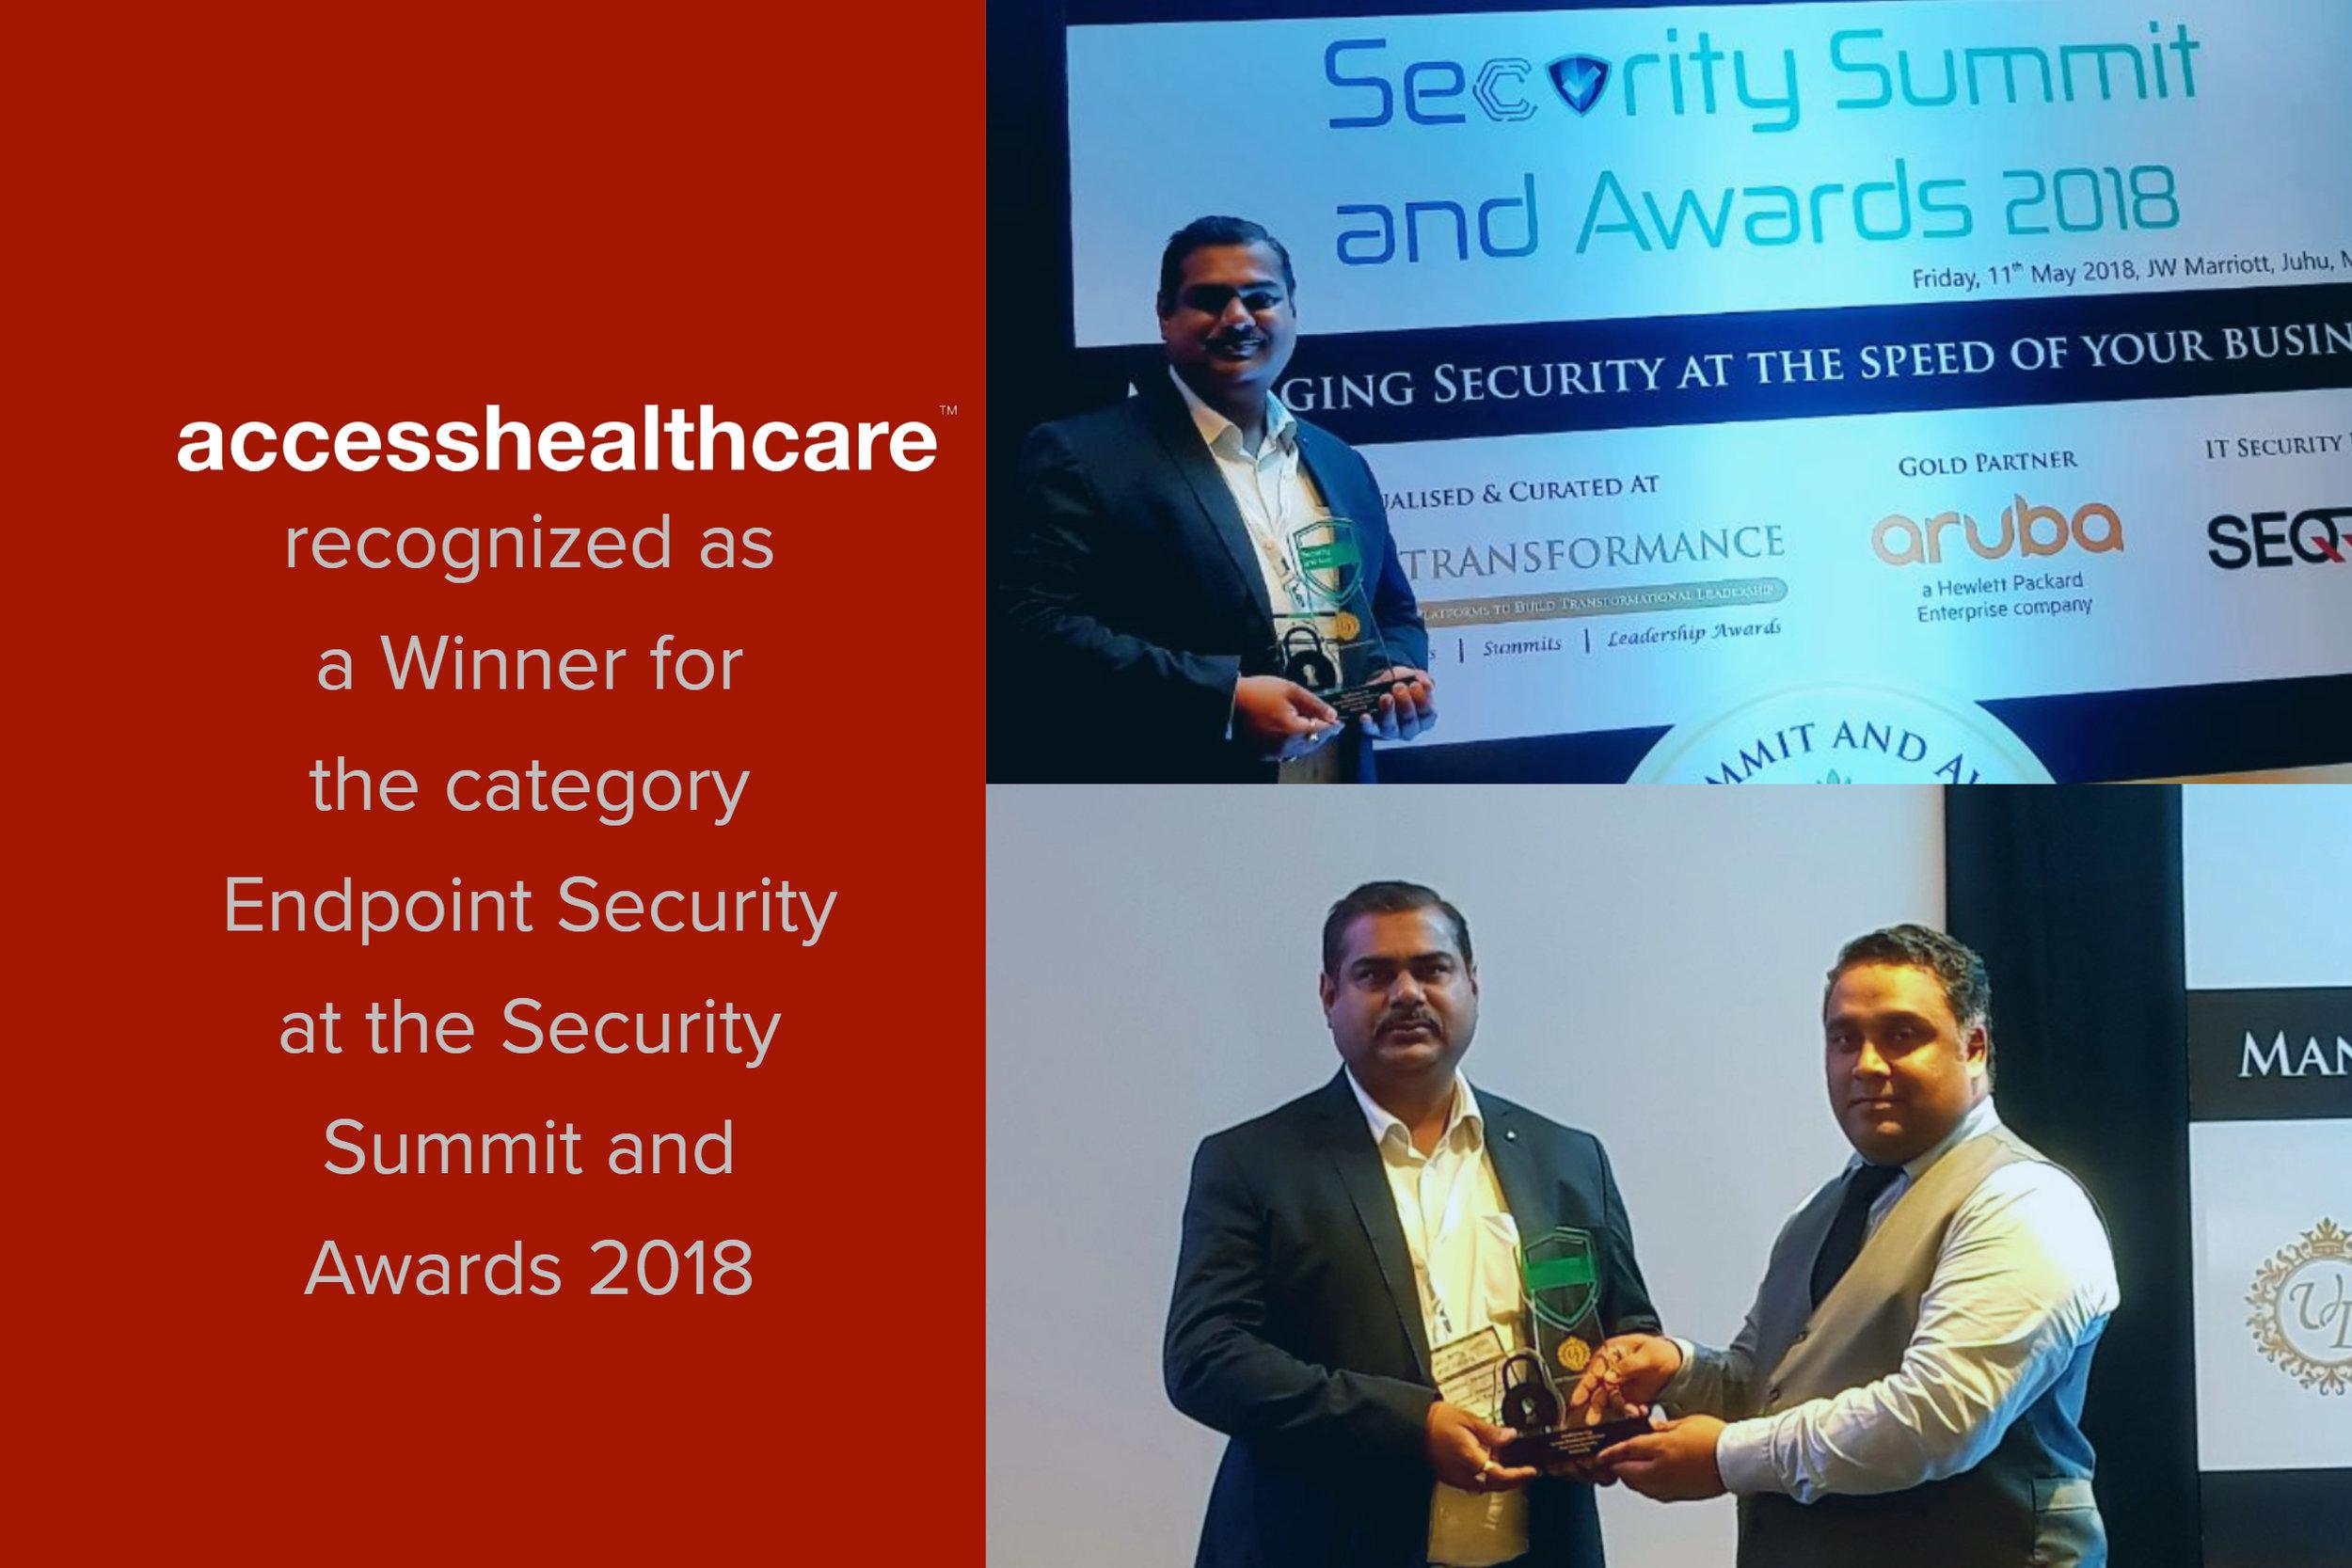 Security+Summit+Awards+2018.jpg